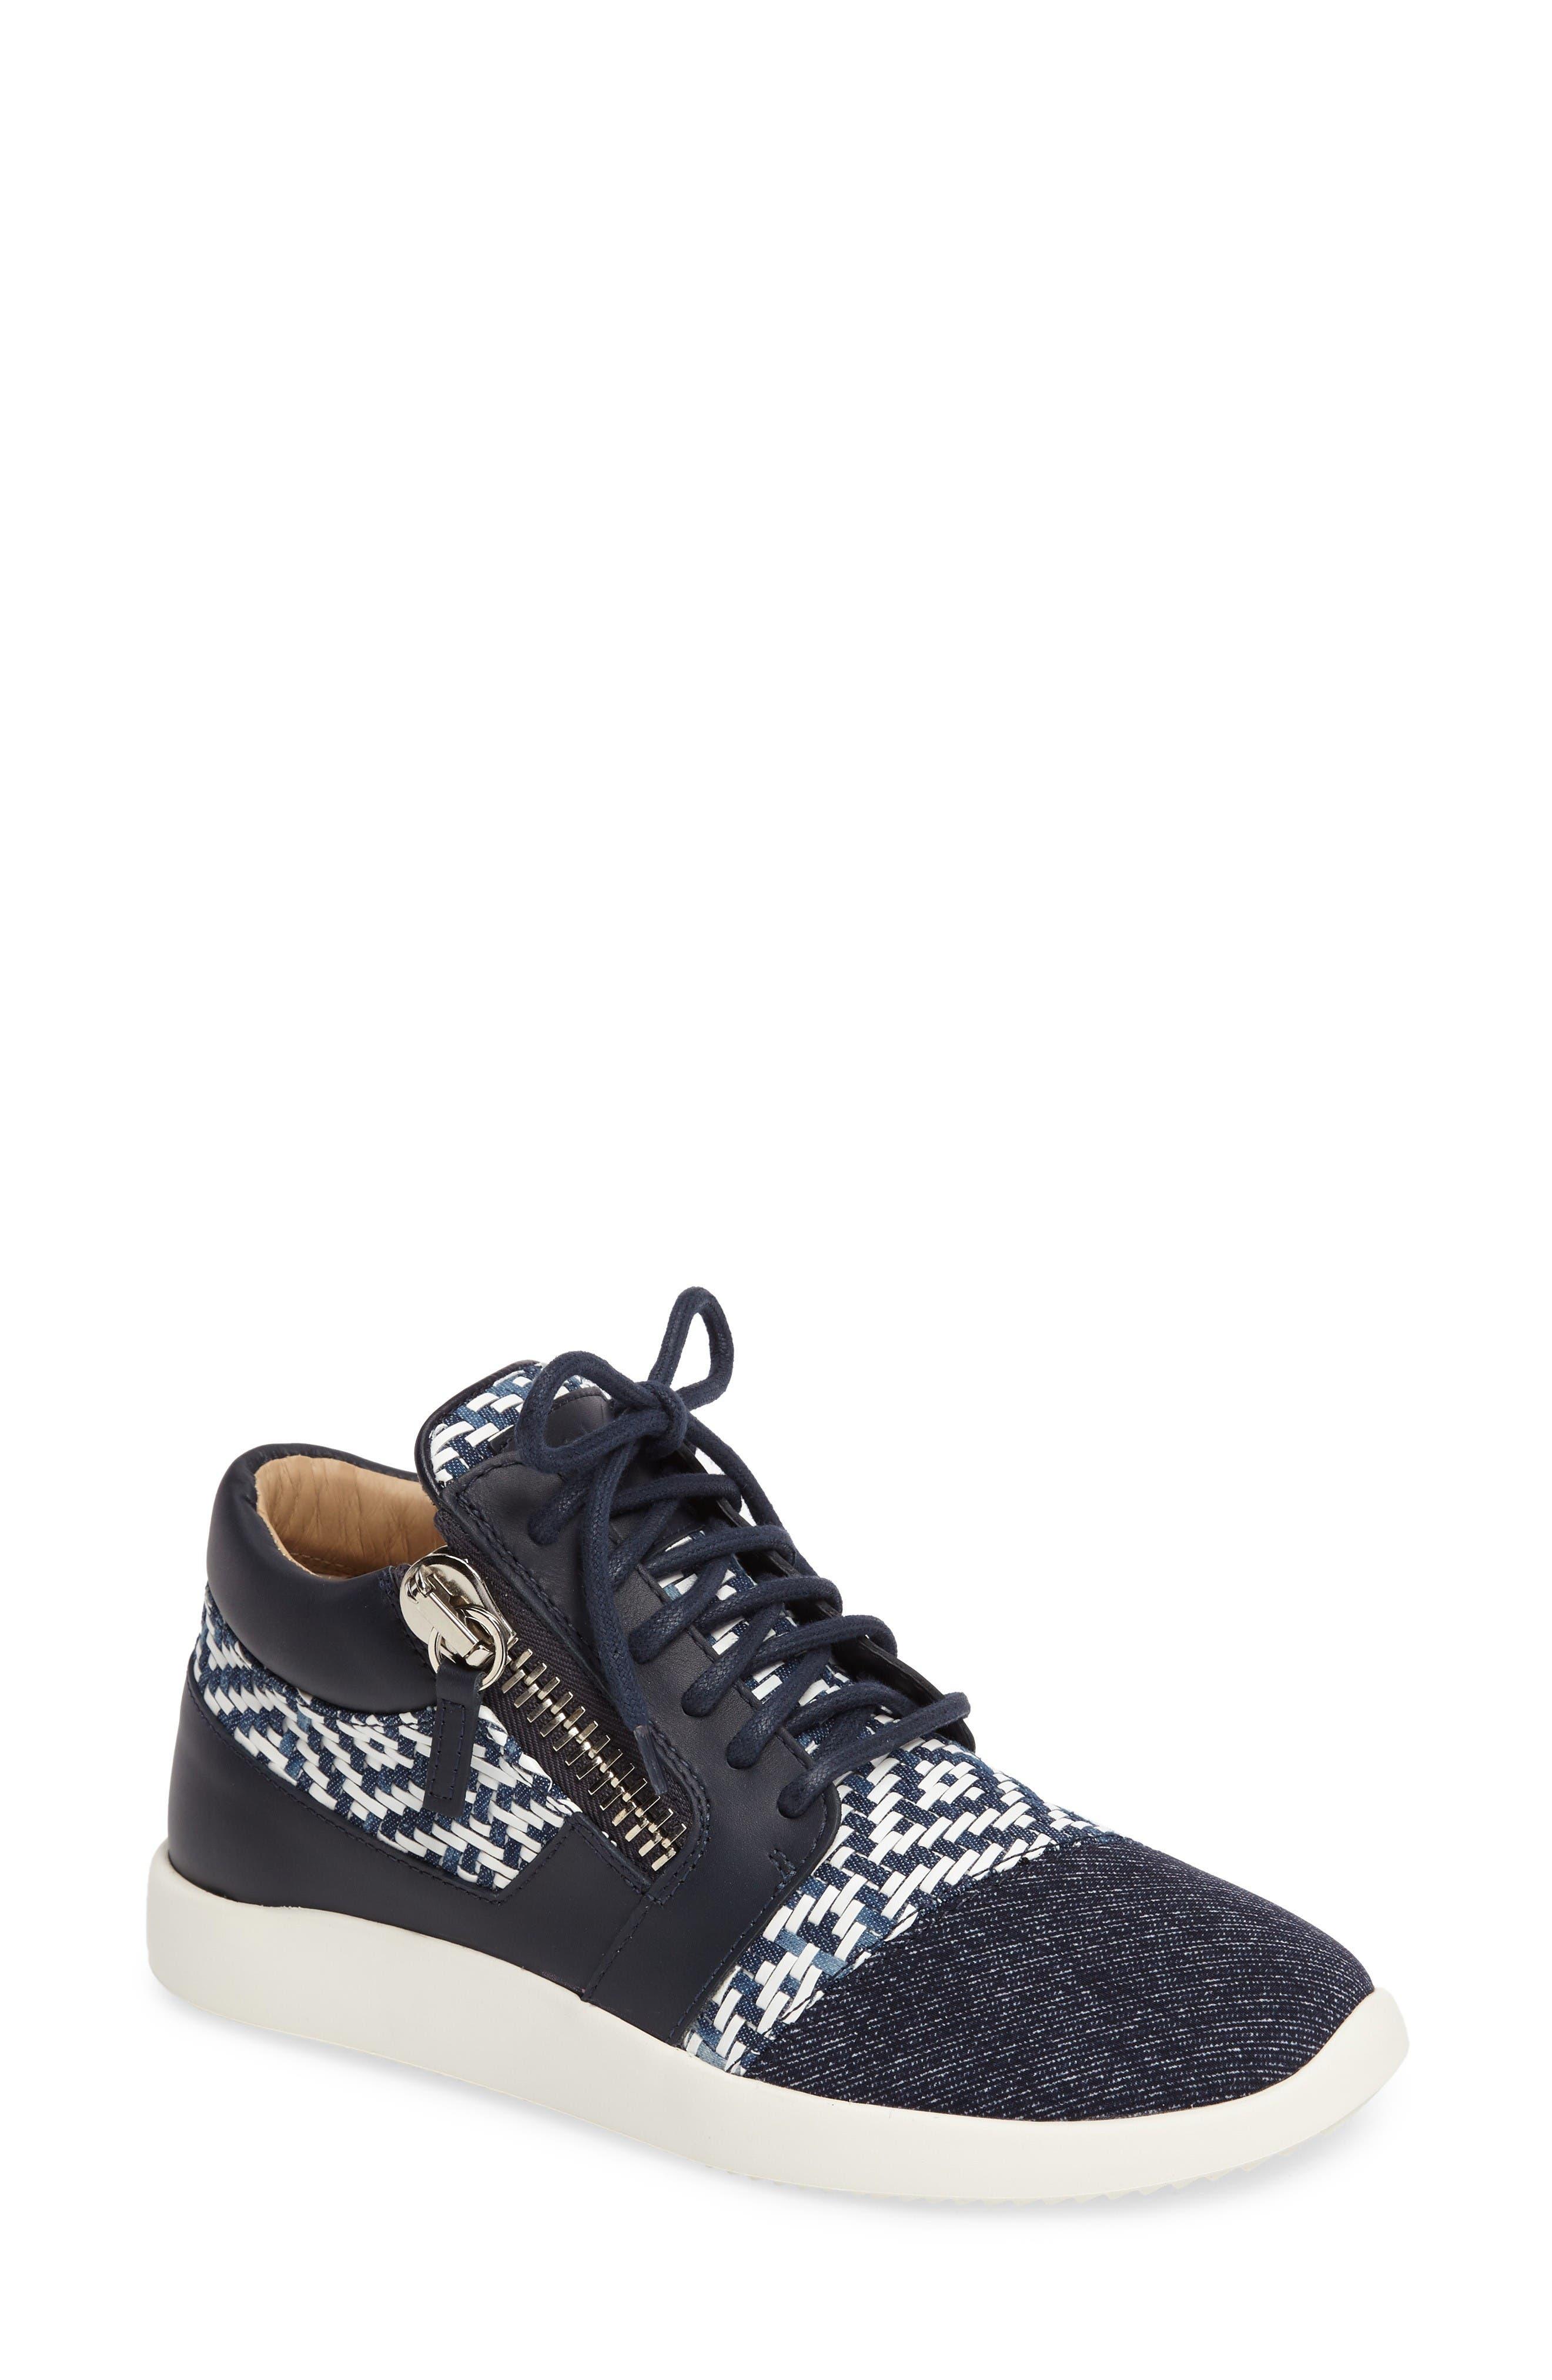 GIUSEPPE ZANOTTI Mixed Media Zip Sneaker